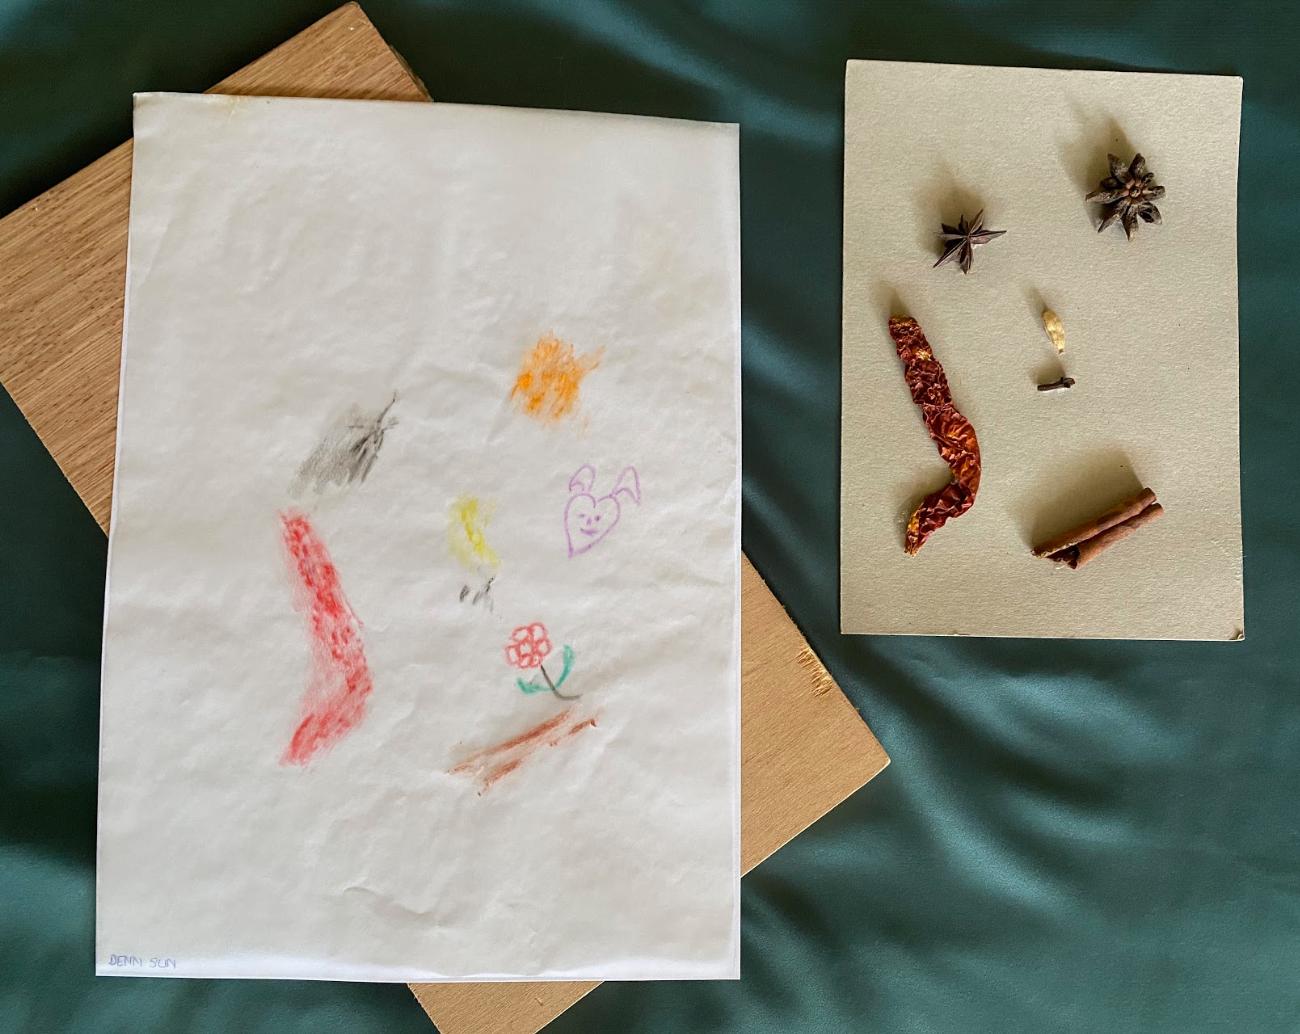 [Denn Sun] Untitled, pastel rubbing on tracing paper, 25cm x 12cm